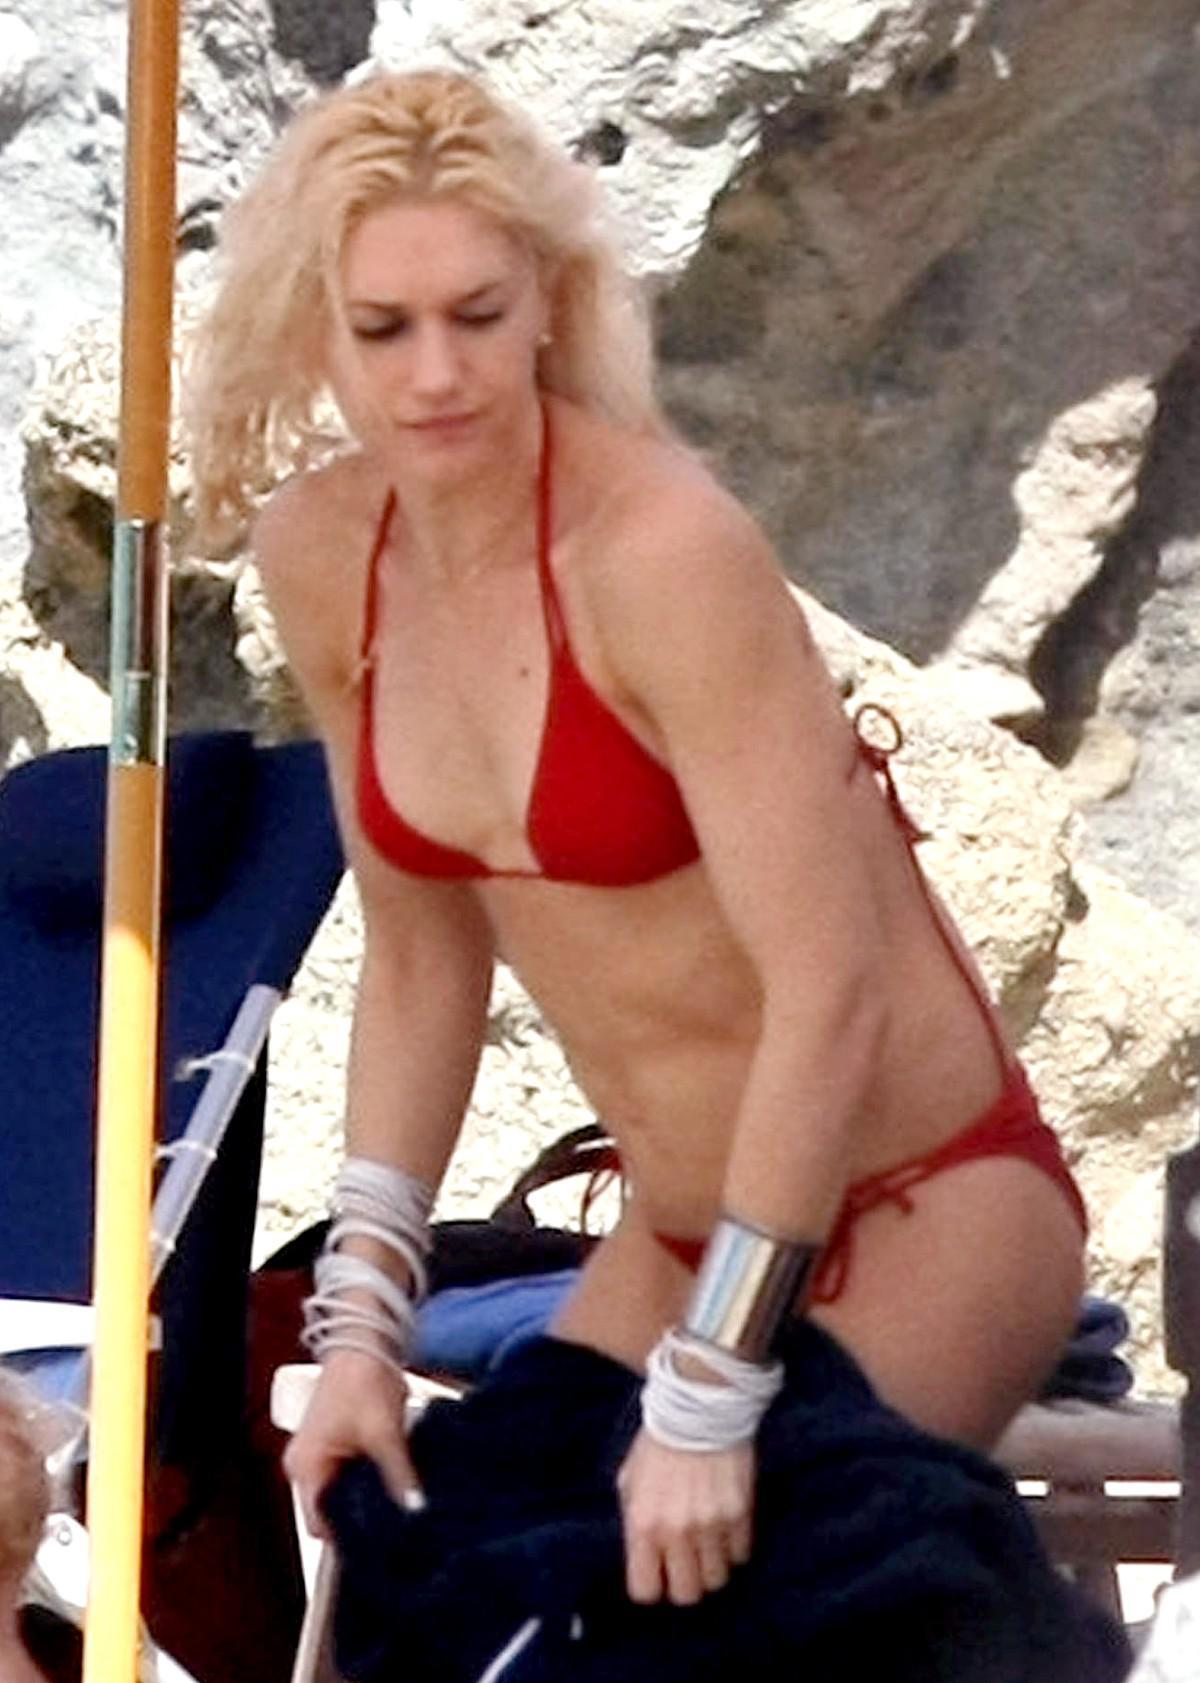 Gwen Stefani Films Herself Masturbating nudes (95 photos), Instagram Celebrity fotos